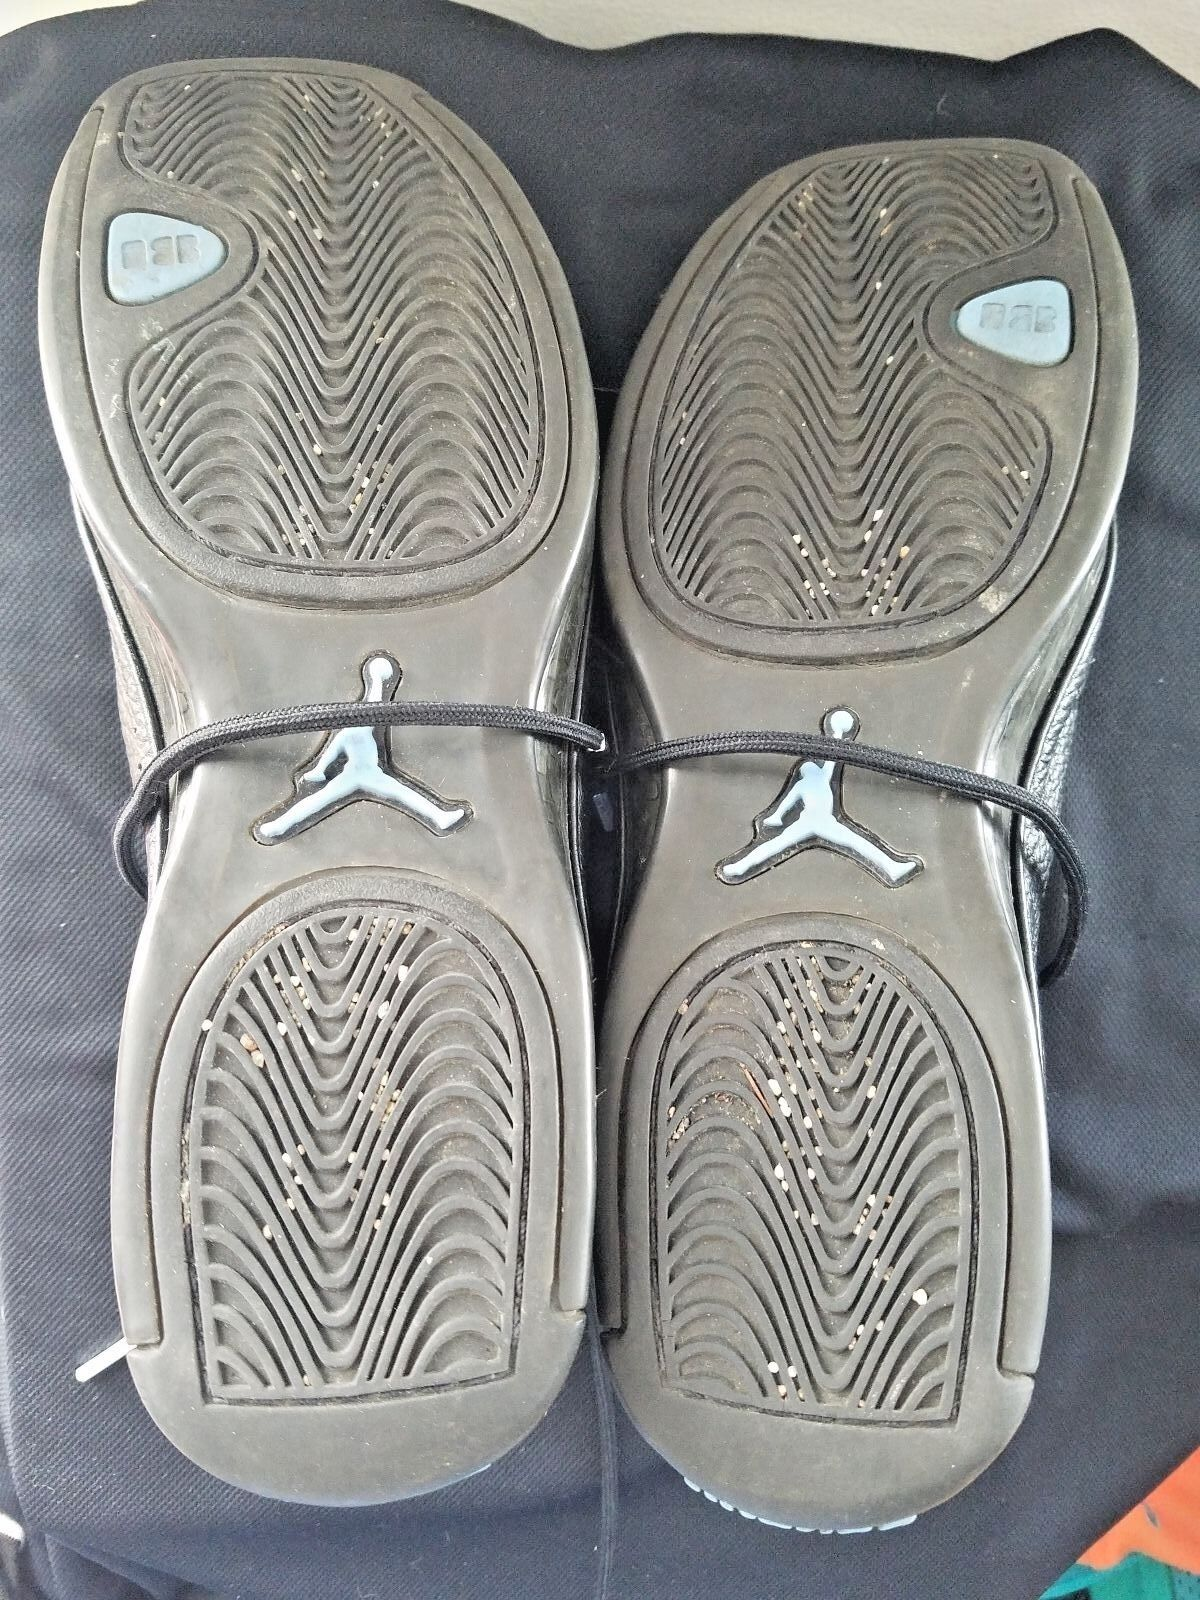 8fa9307467 Air Jordan .5 Carbon Nike Sneakers Black Size 9.5. Beautiful Beautiful  Beautiful Condition!